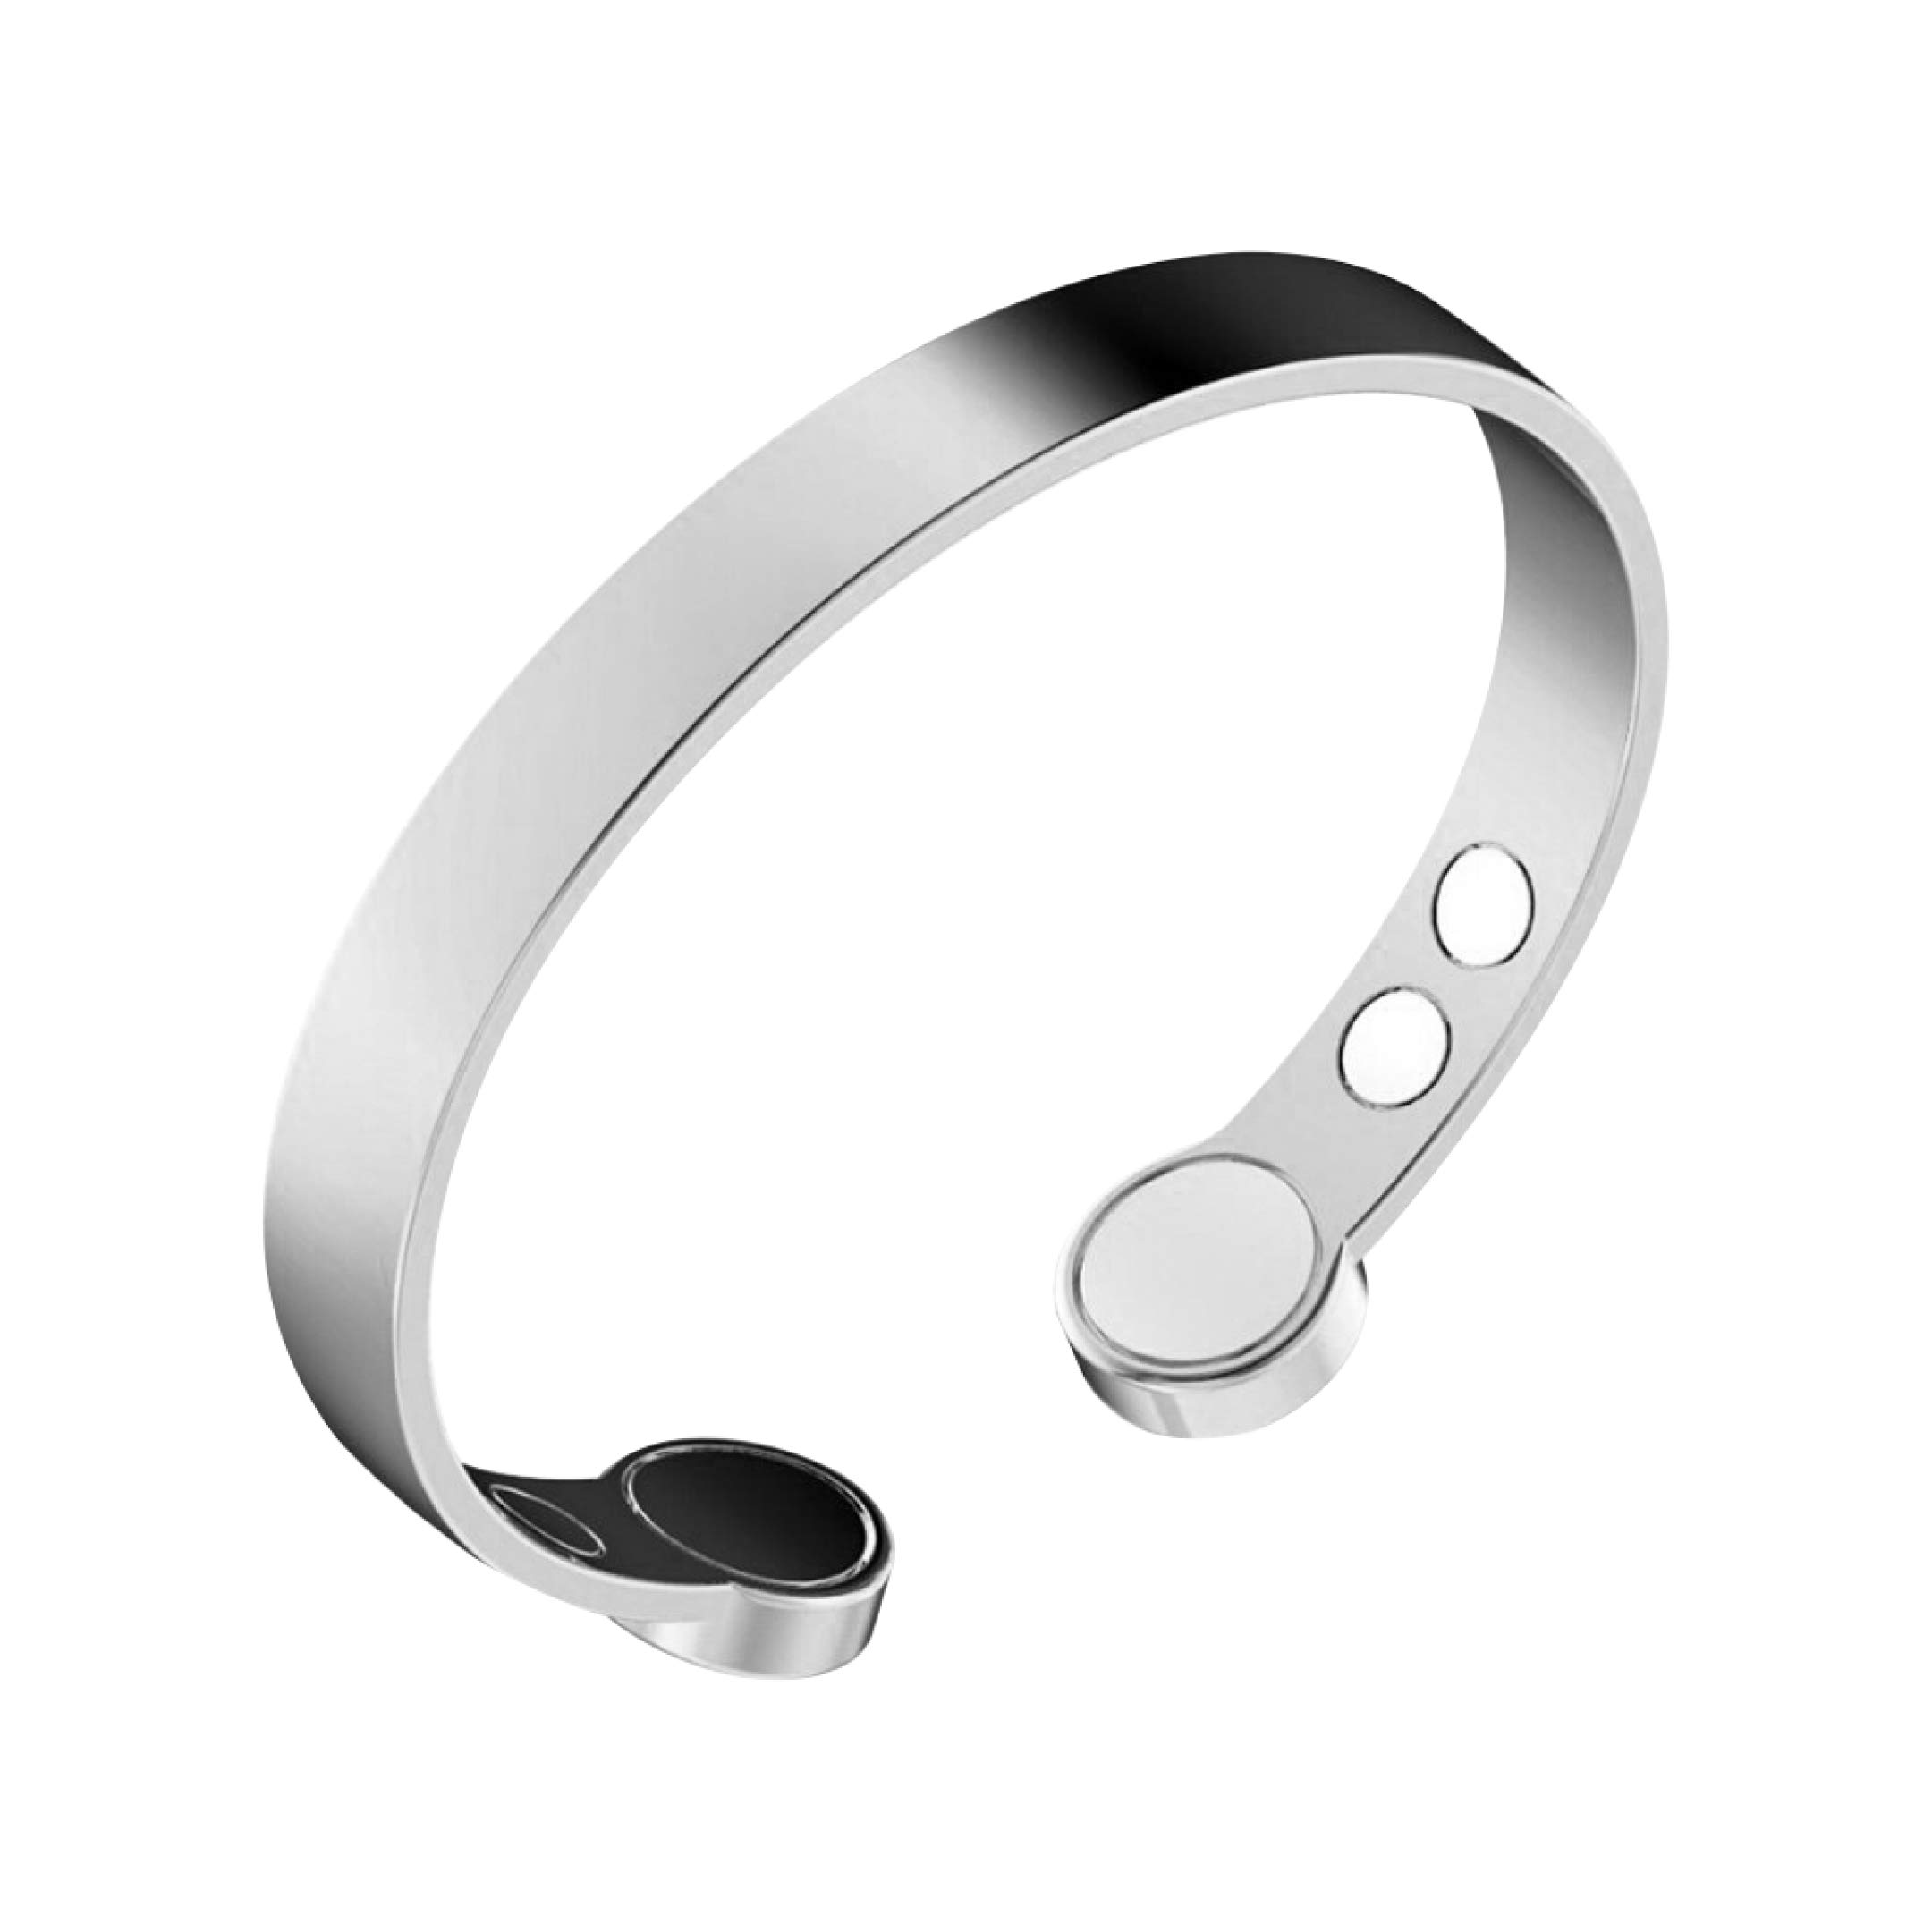 Rosian & Levine Copper Bracelet for Arthritis, Migraine & Pain Relief, Osteoarthritis, Menopause Support, Hot Flushes, Carpal Tunnel Plated Magnetic Bracelets Sale Gift Men Women (Medium 17.5 cm)